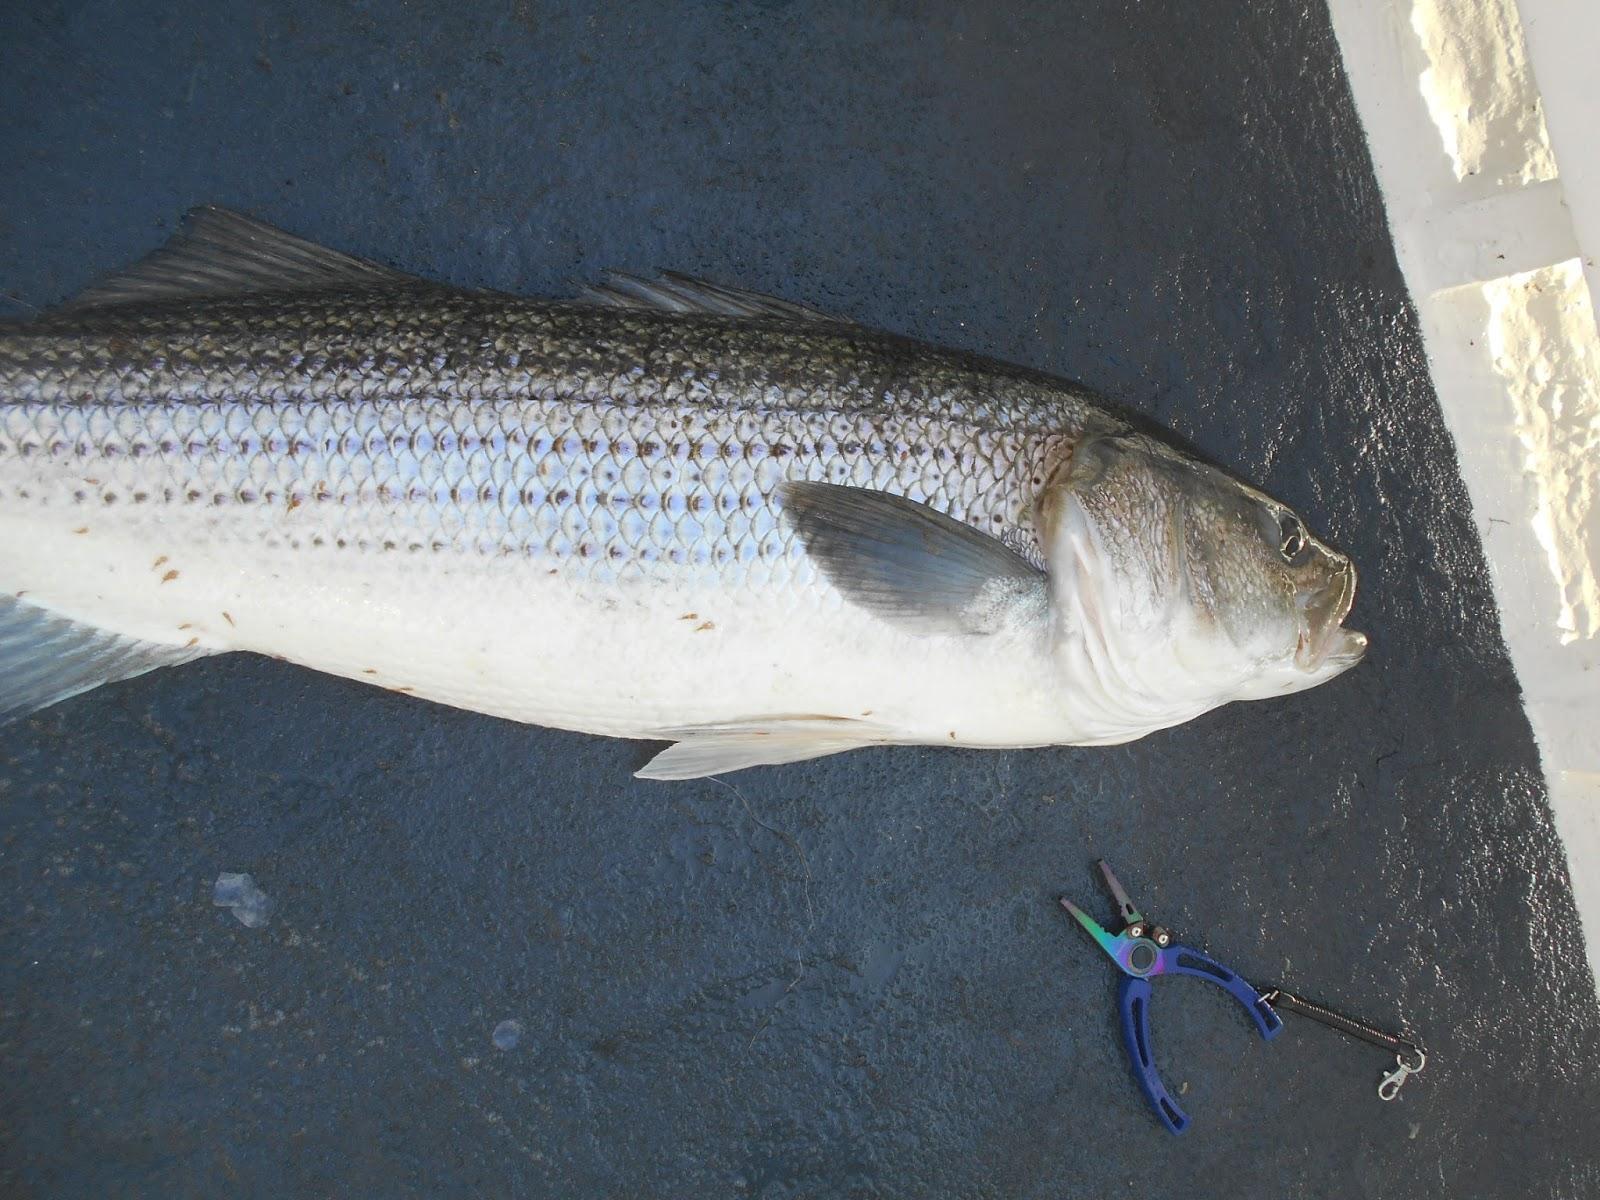 Nj salt fish 2016 06 01 captain cal belmar for Nj saltwater fishing license